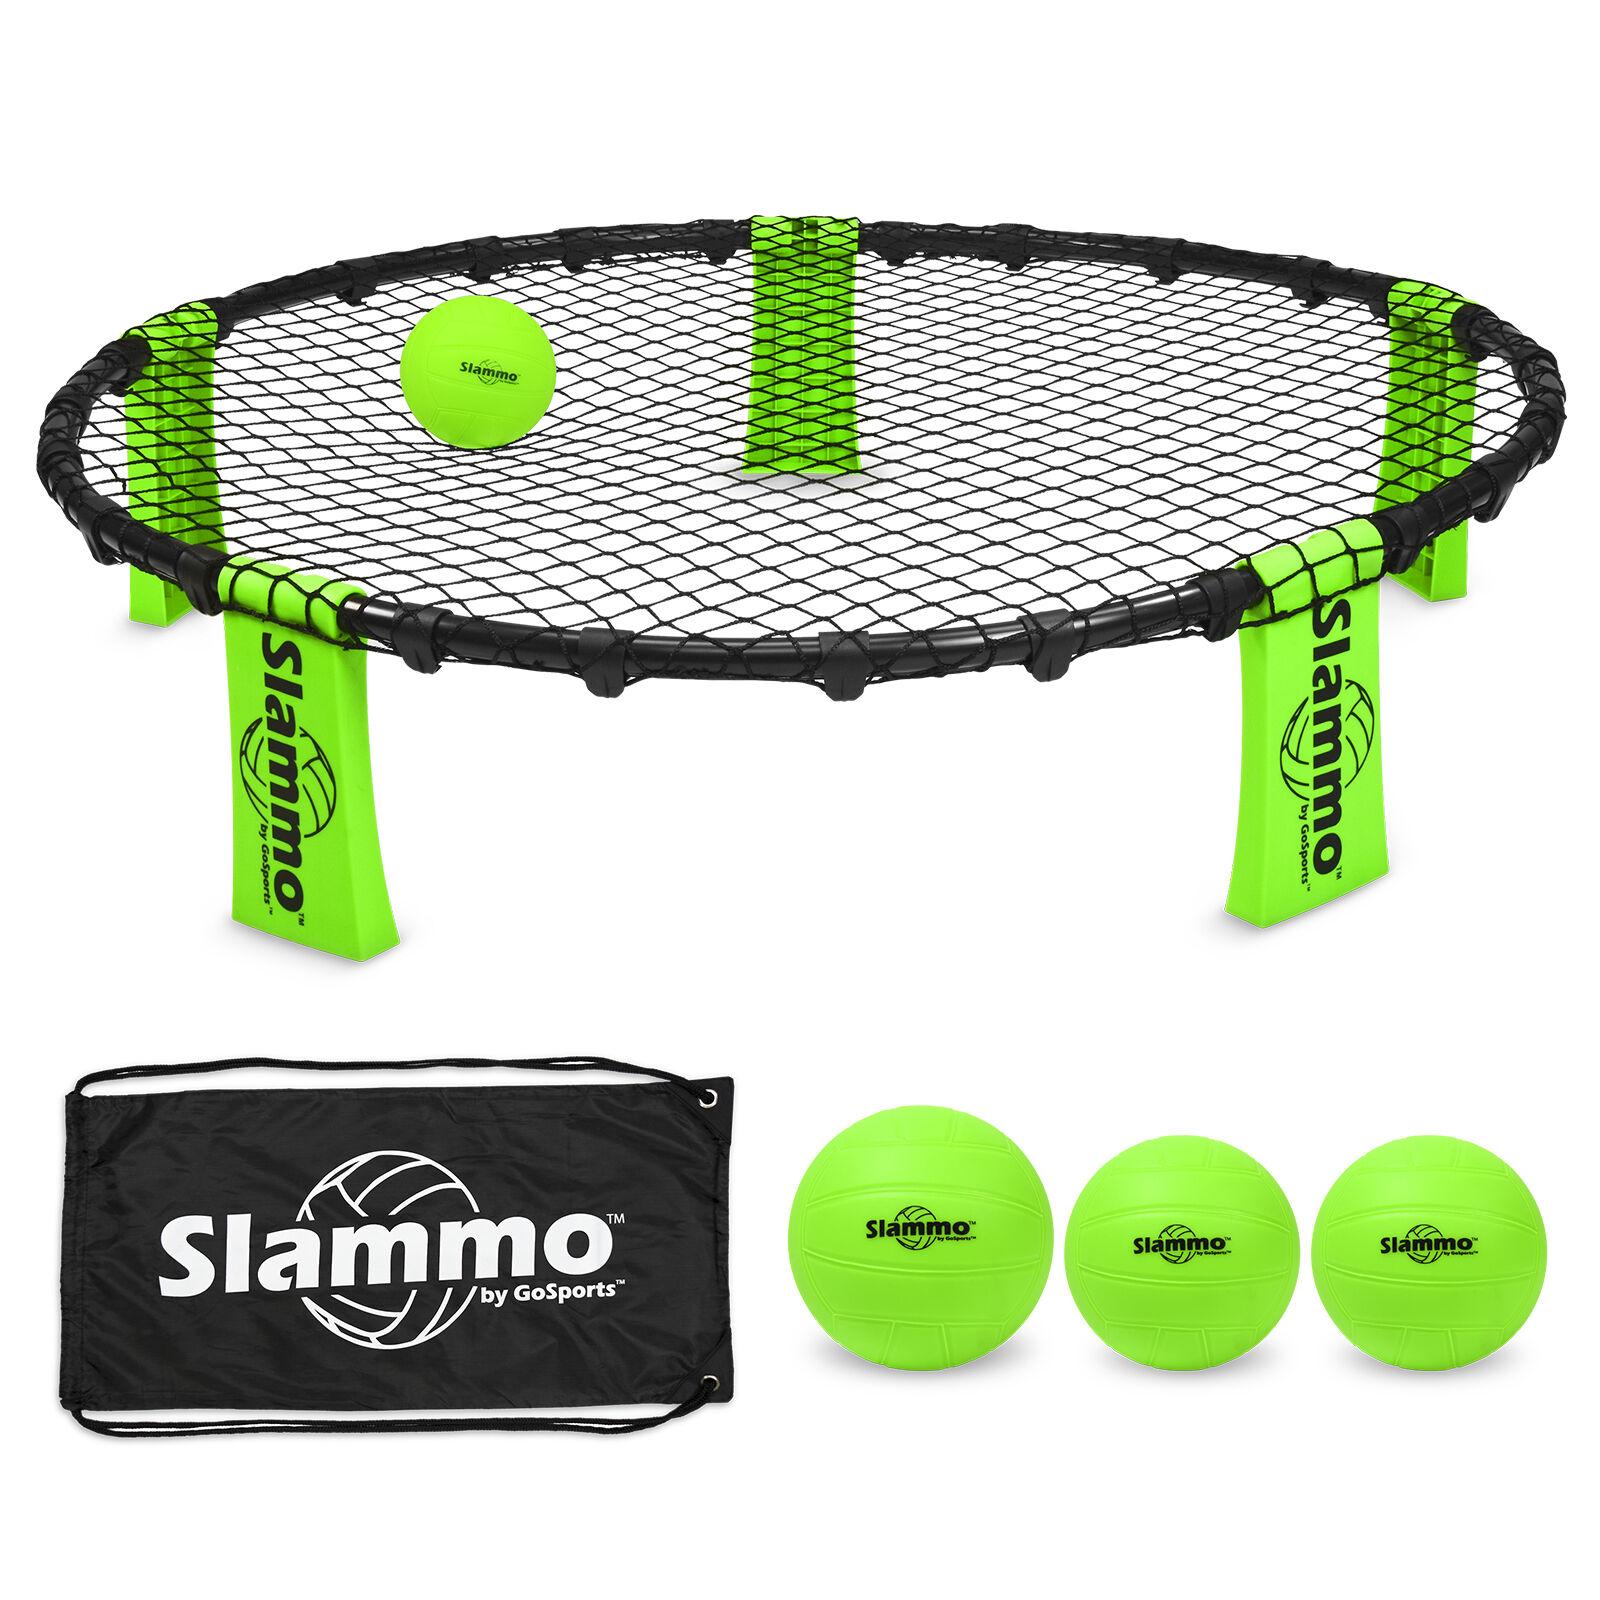 GoSports Slammo™ 2 vs 2 Four-Square meets Volleyball